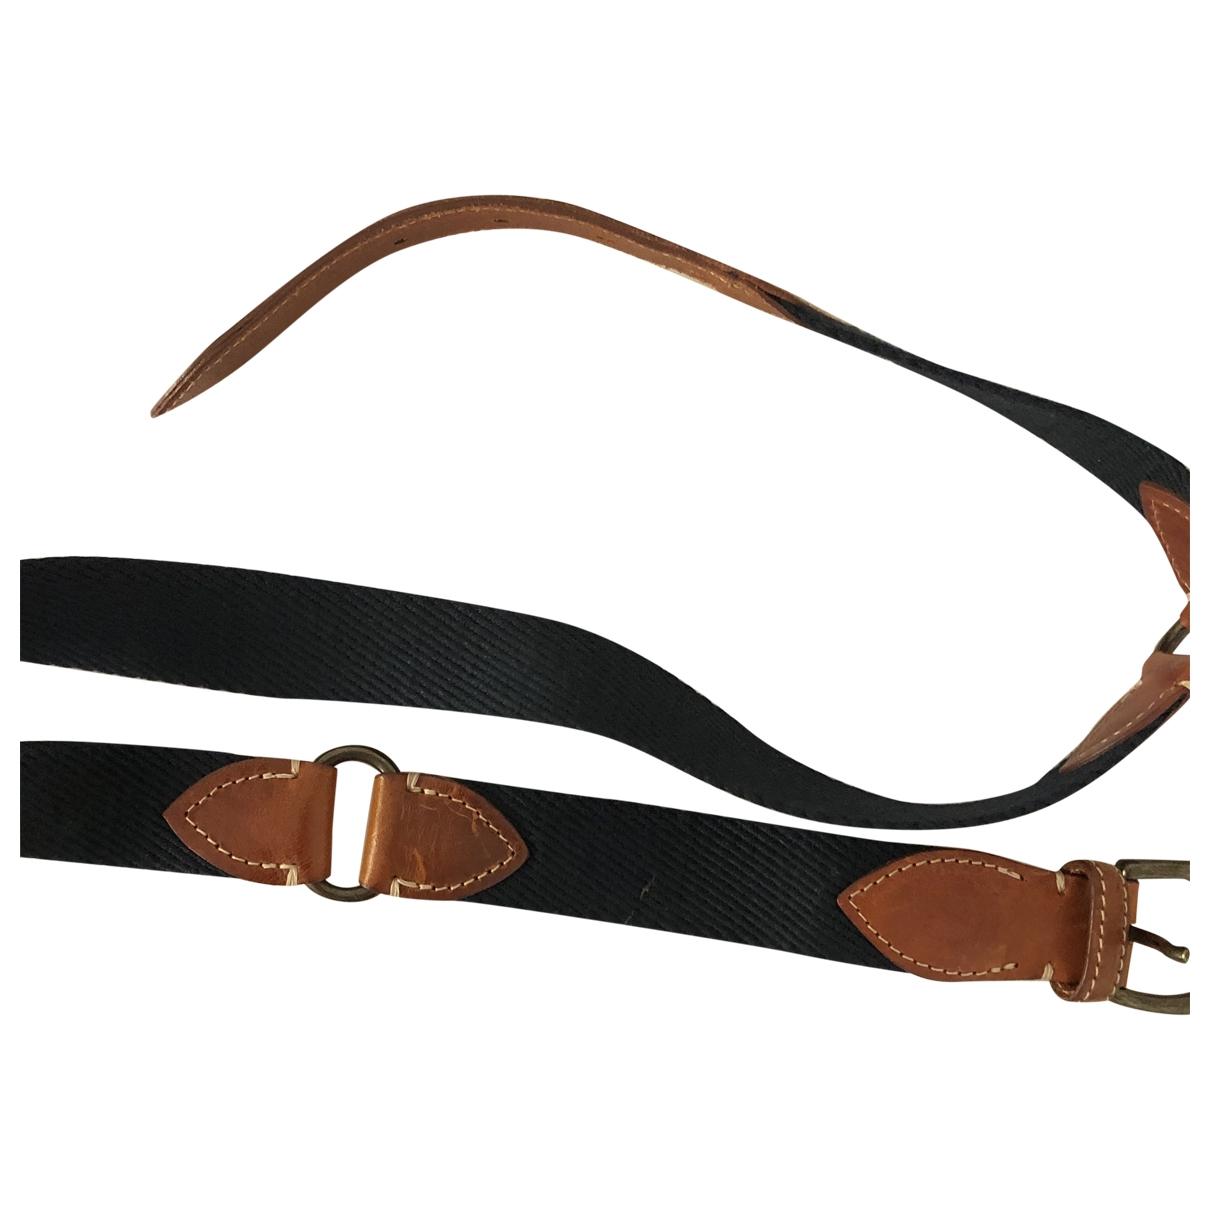 Cinturon de Lona Tommy Hilfiger